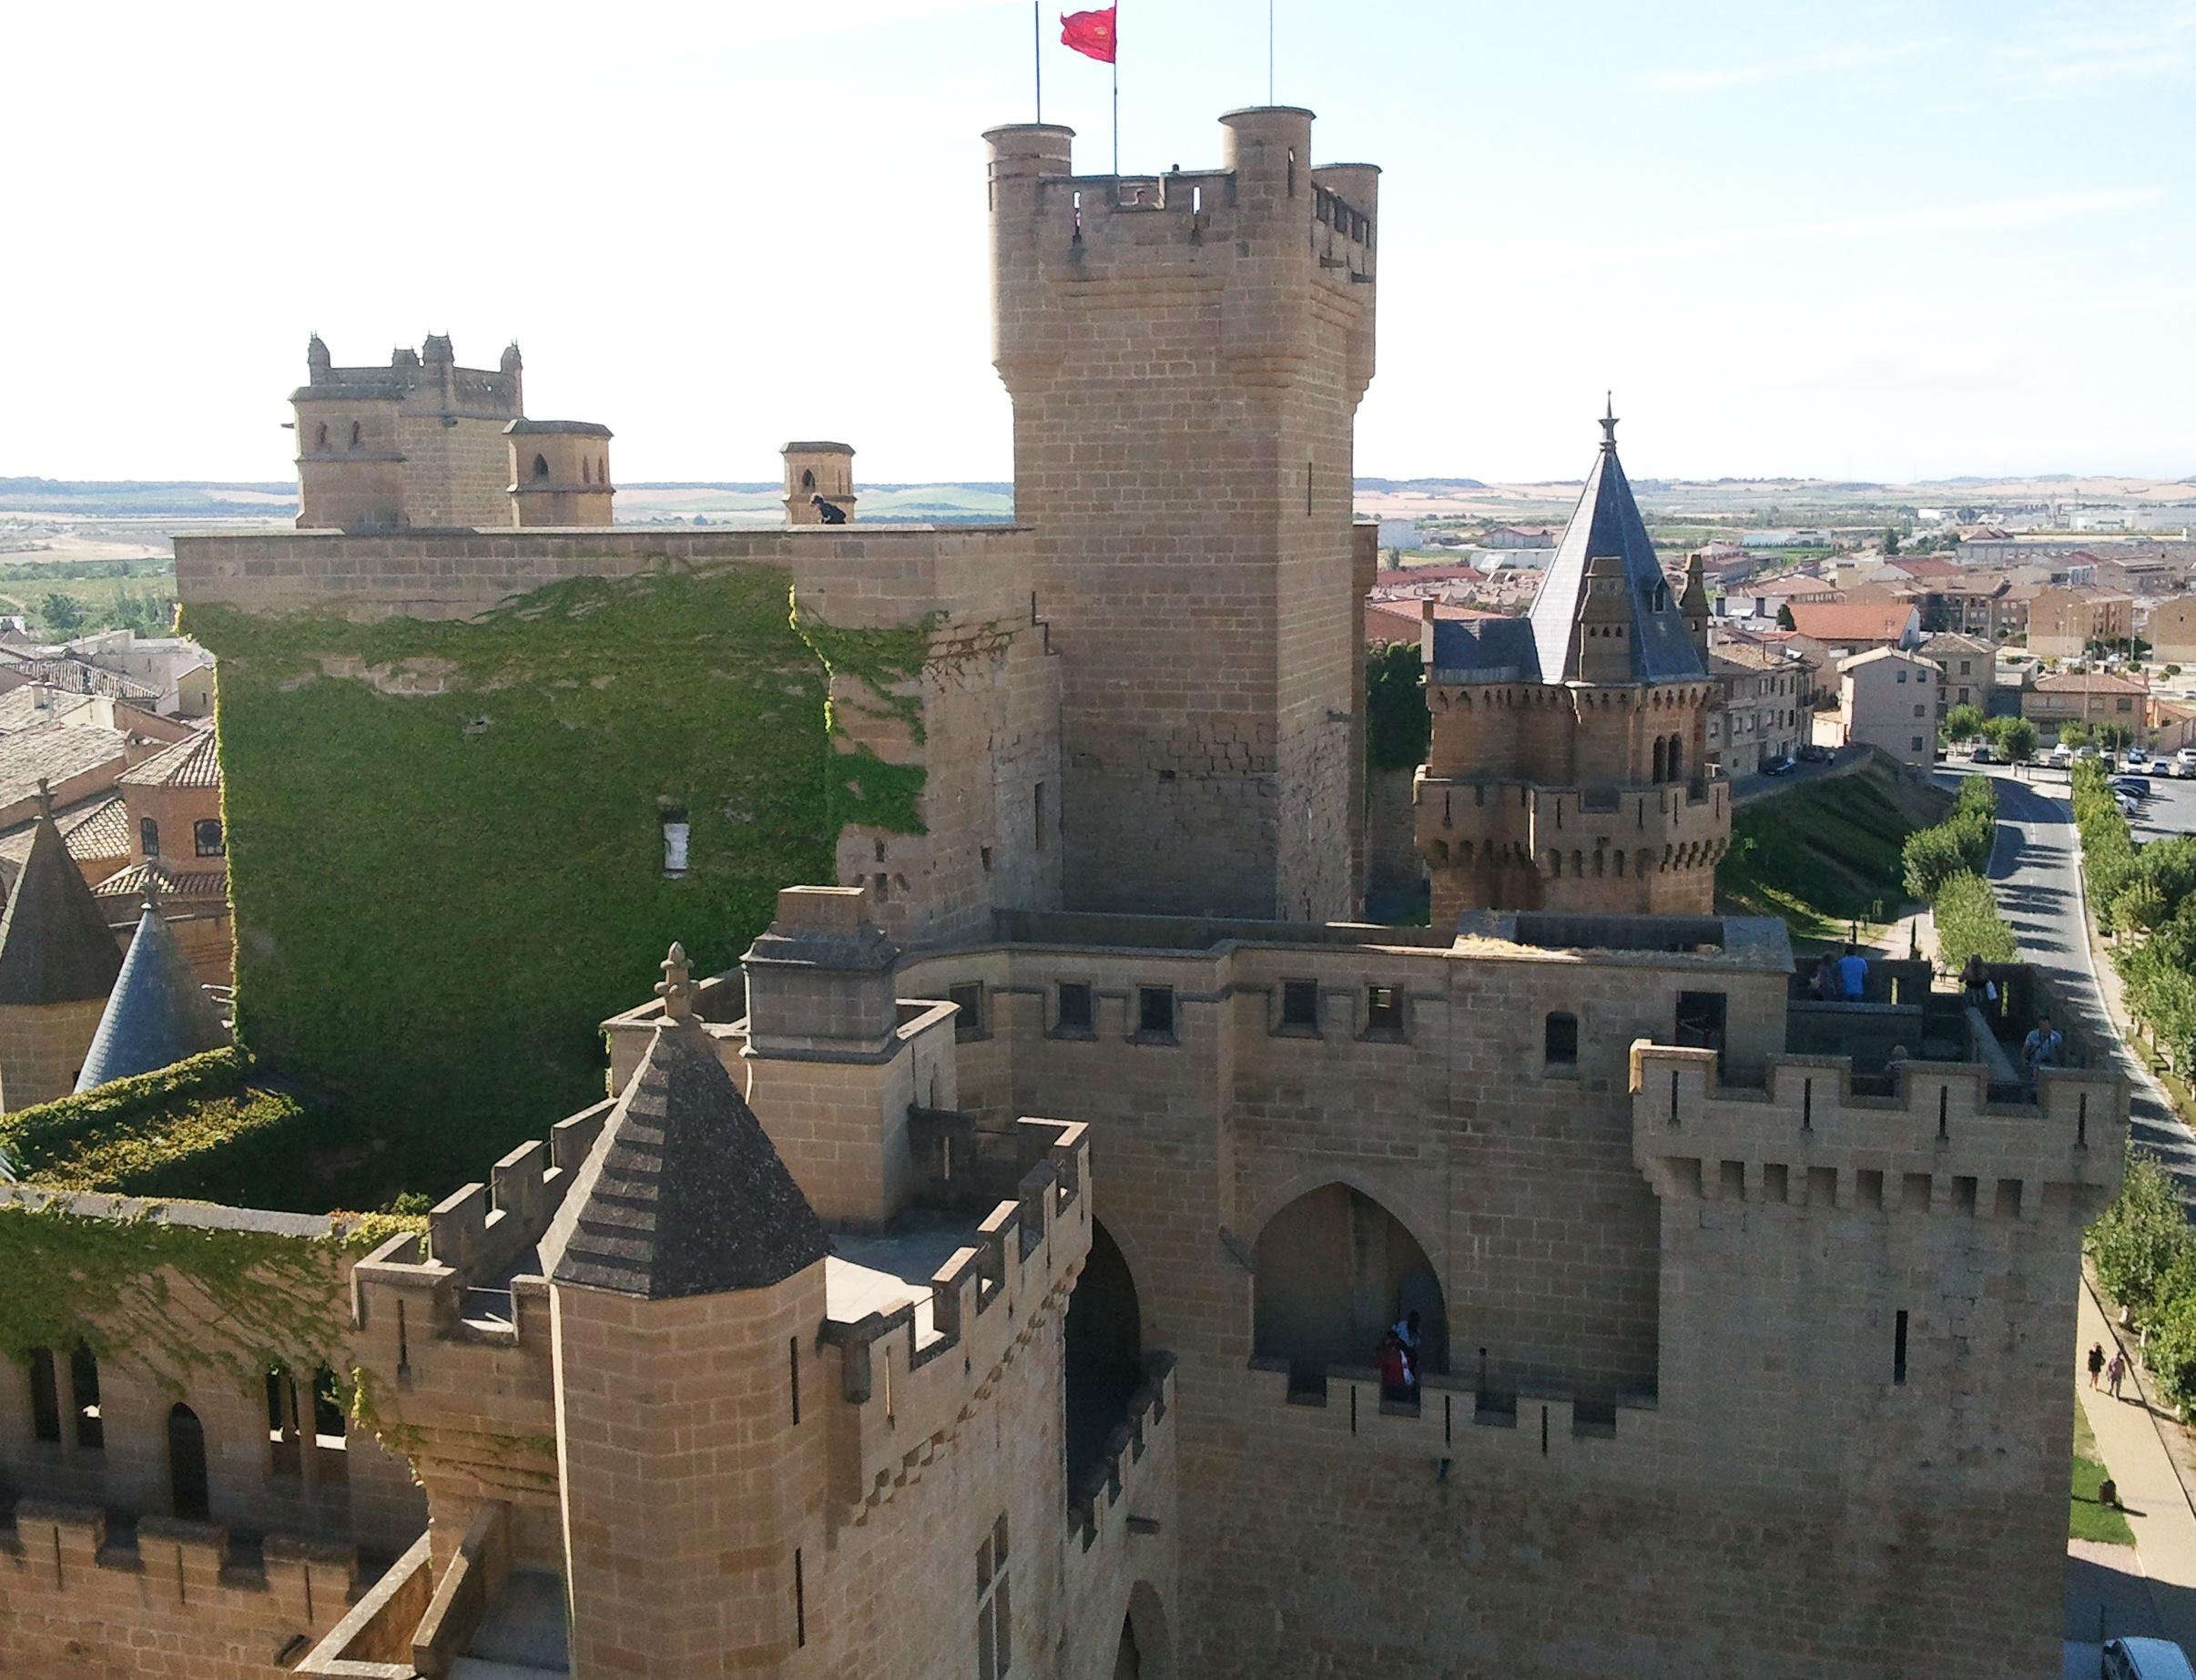 Navarra Spain  city photos gallery : Description Castillo de Olite, Navarra Spain